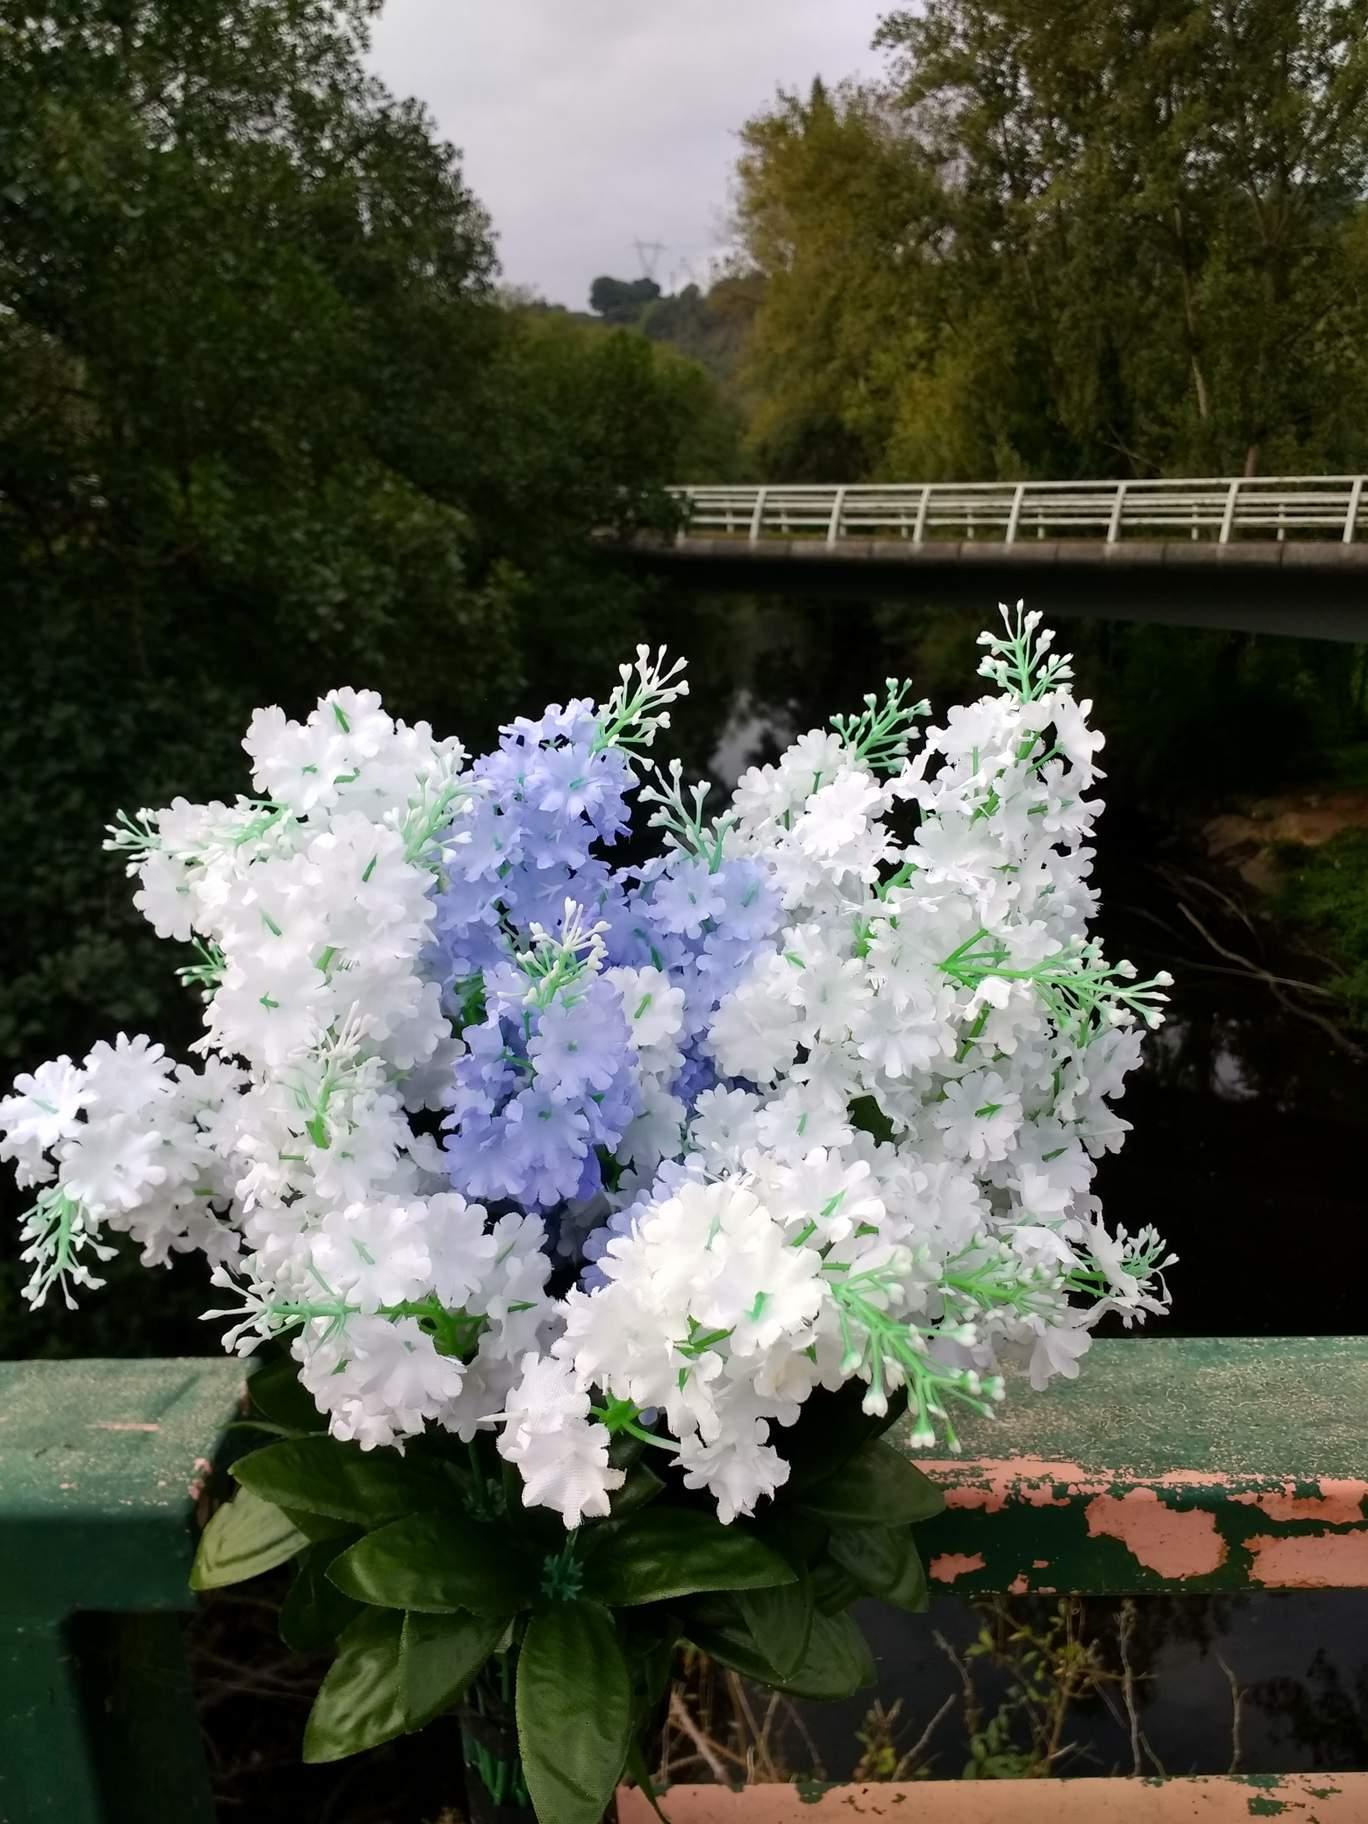 Camino de santiago days 12 17 primitivo beautiful flowers on a bridge in gallegos spain izmirmasajfo